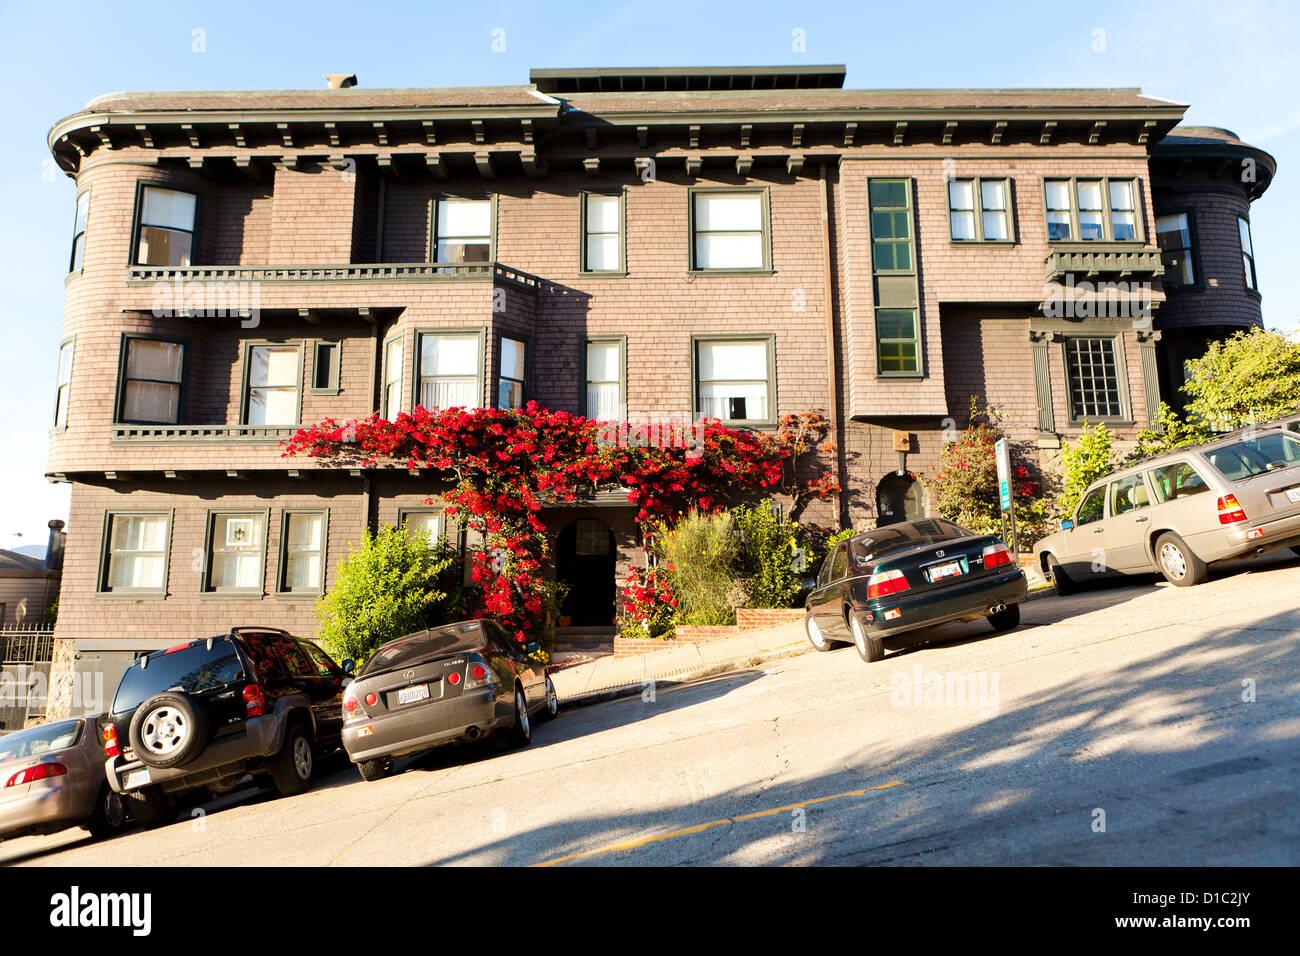 Steep grade street - San Francisco, California USA - Stock Image